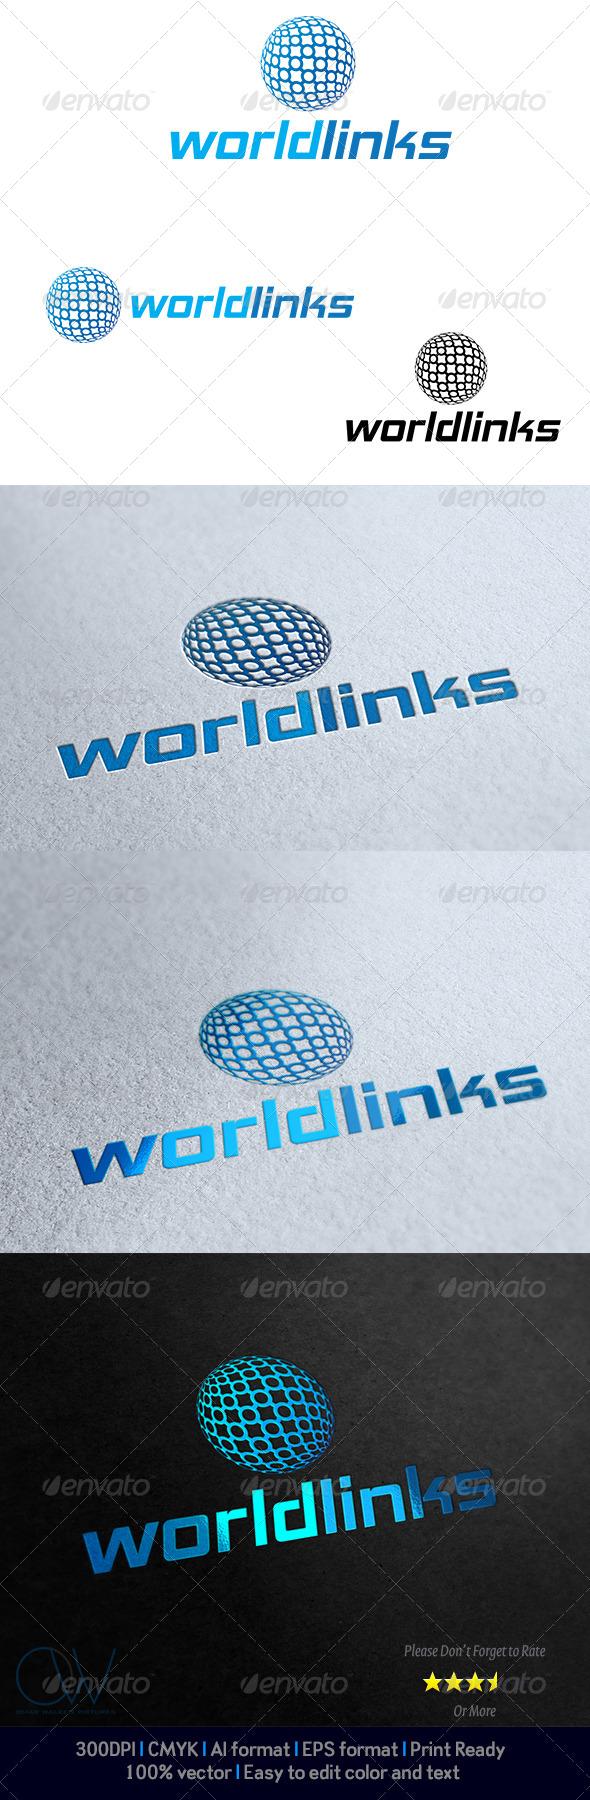 Worldlinks Logo - Logo Templates